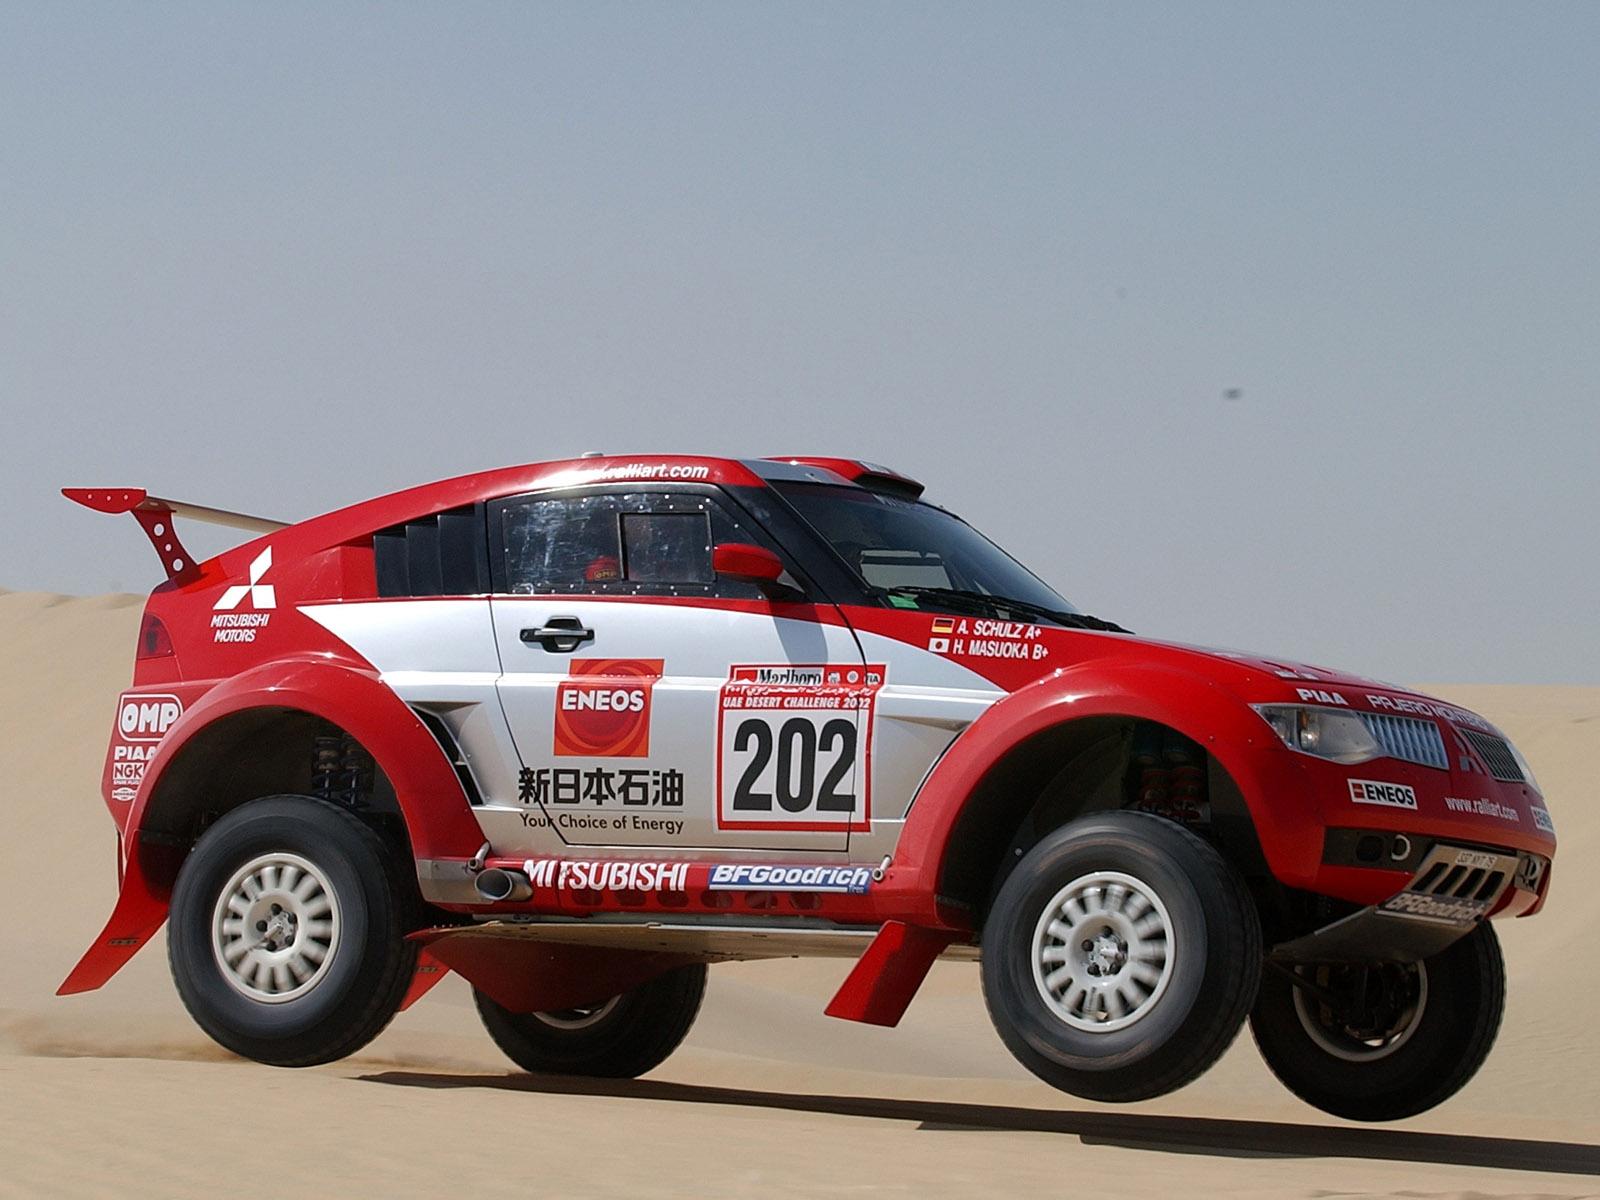 http://3.bp.blogspot.com/-WL0ewd29g6Y/T6YKXfcAWQI/AAAAAAAAA5o/C2ZUEuZ_7MU/s1600/Mitsubishi+Pajero+Sport+Car+Pictures.jpg